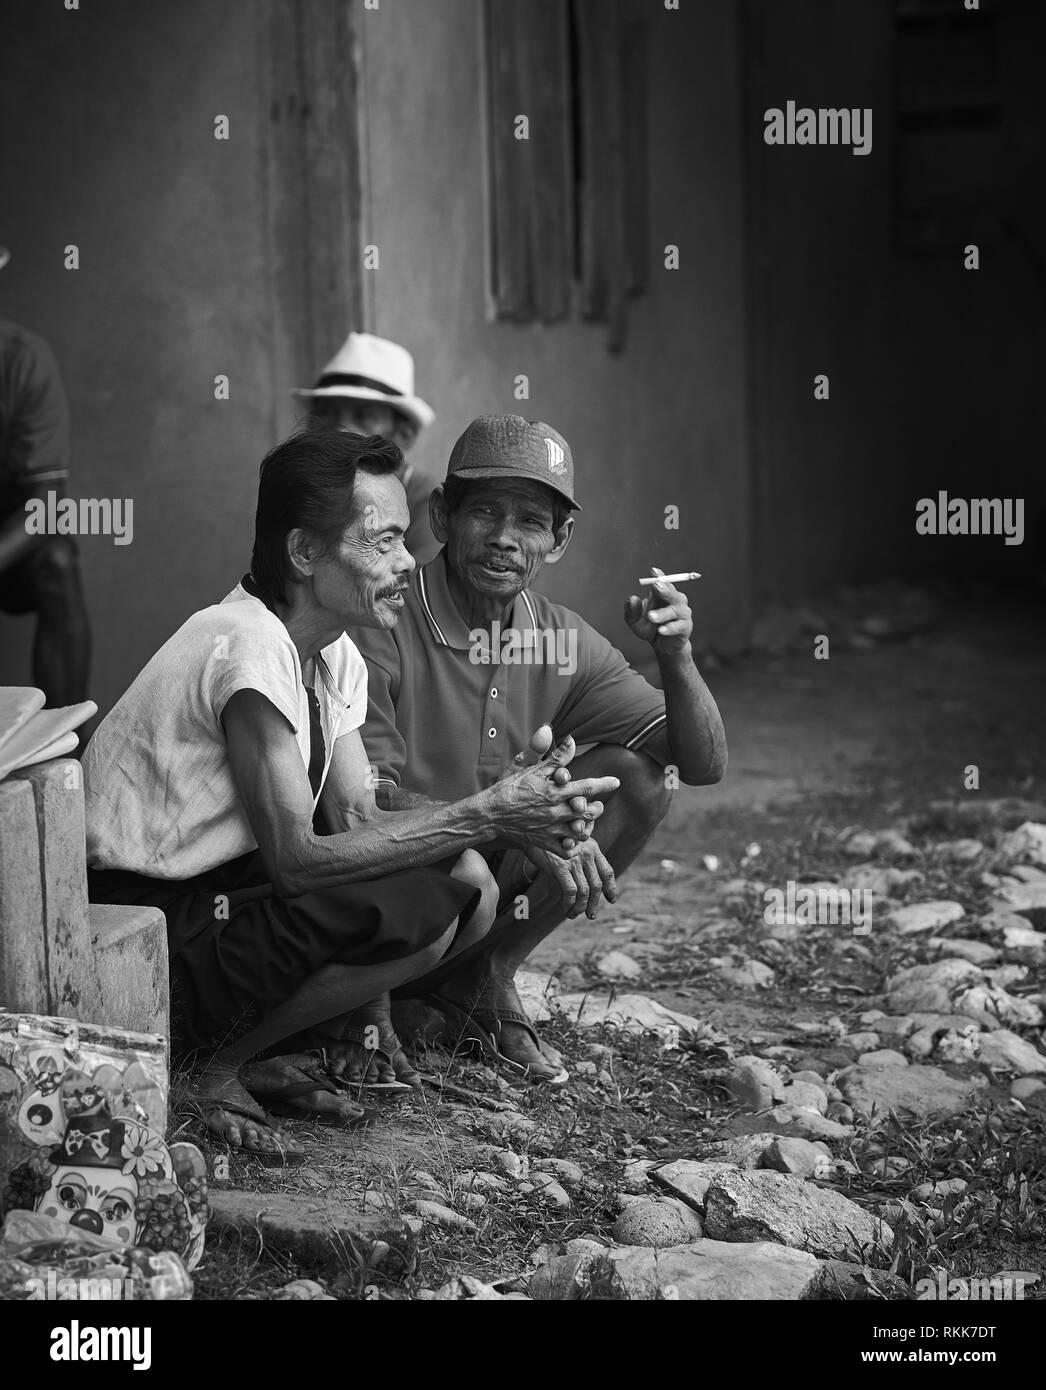 Indonesian people speaking while smoking - Stock Image